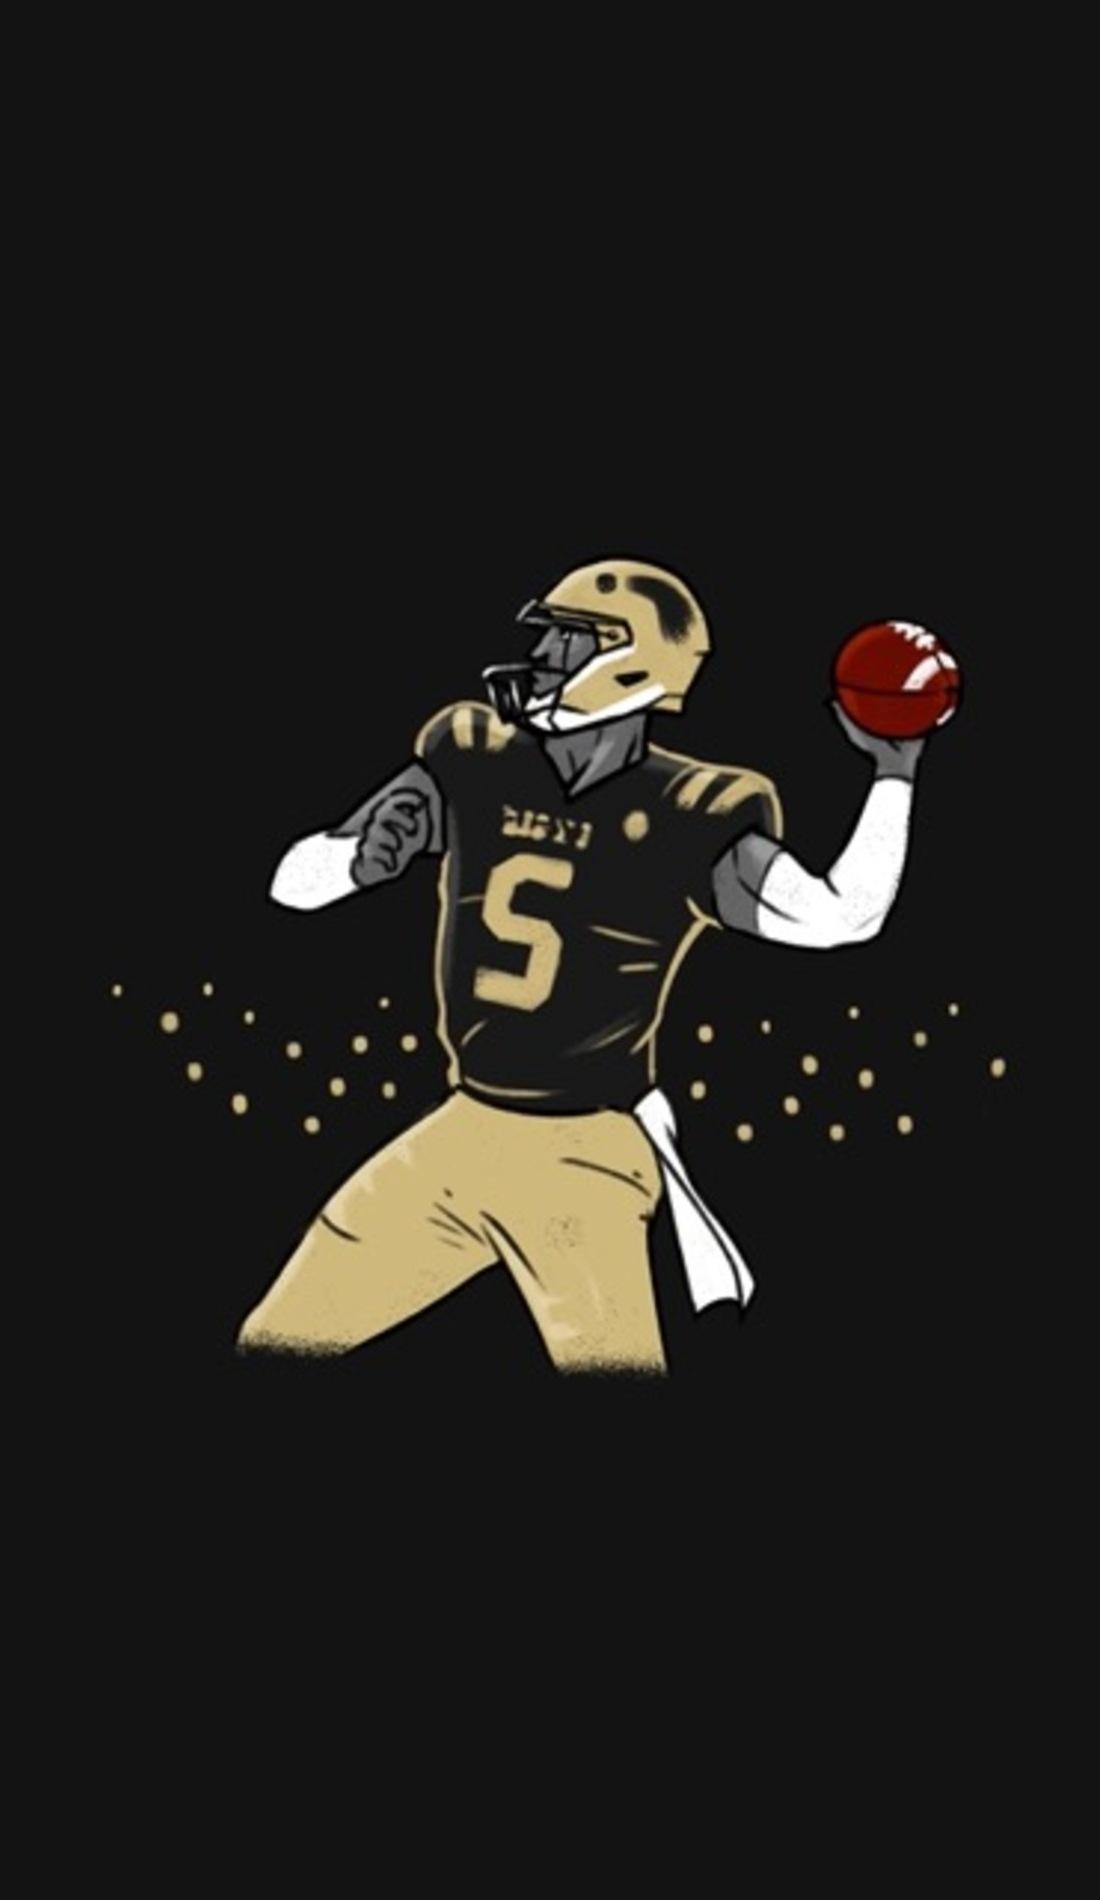 A Colorado Buffaloes Football live event